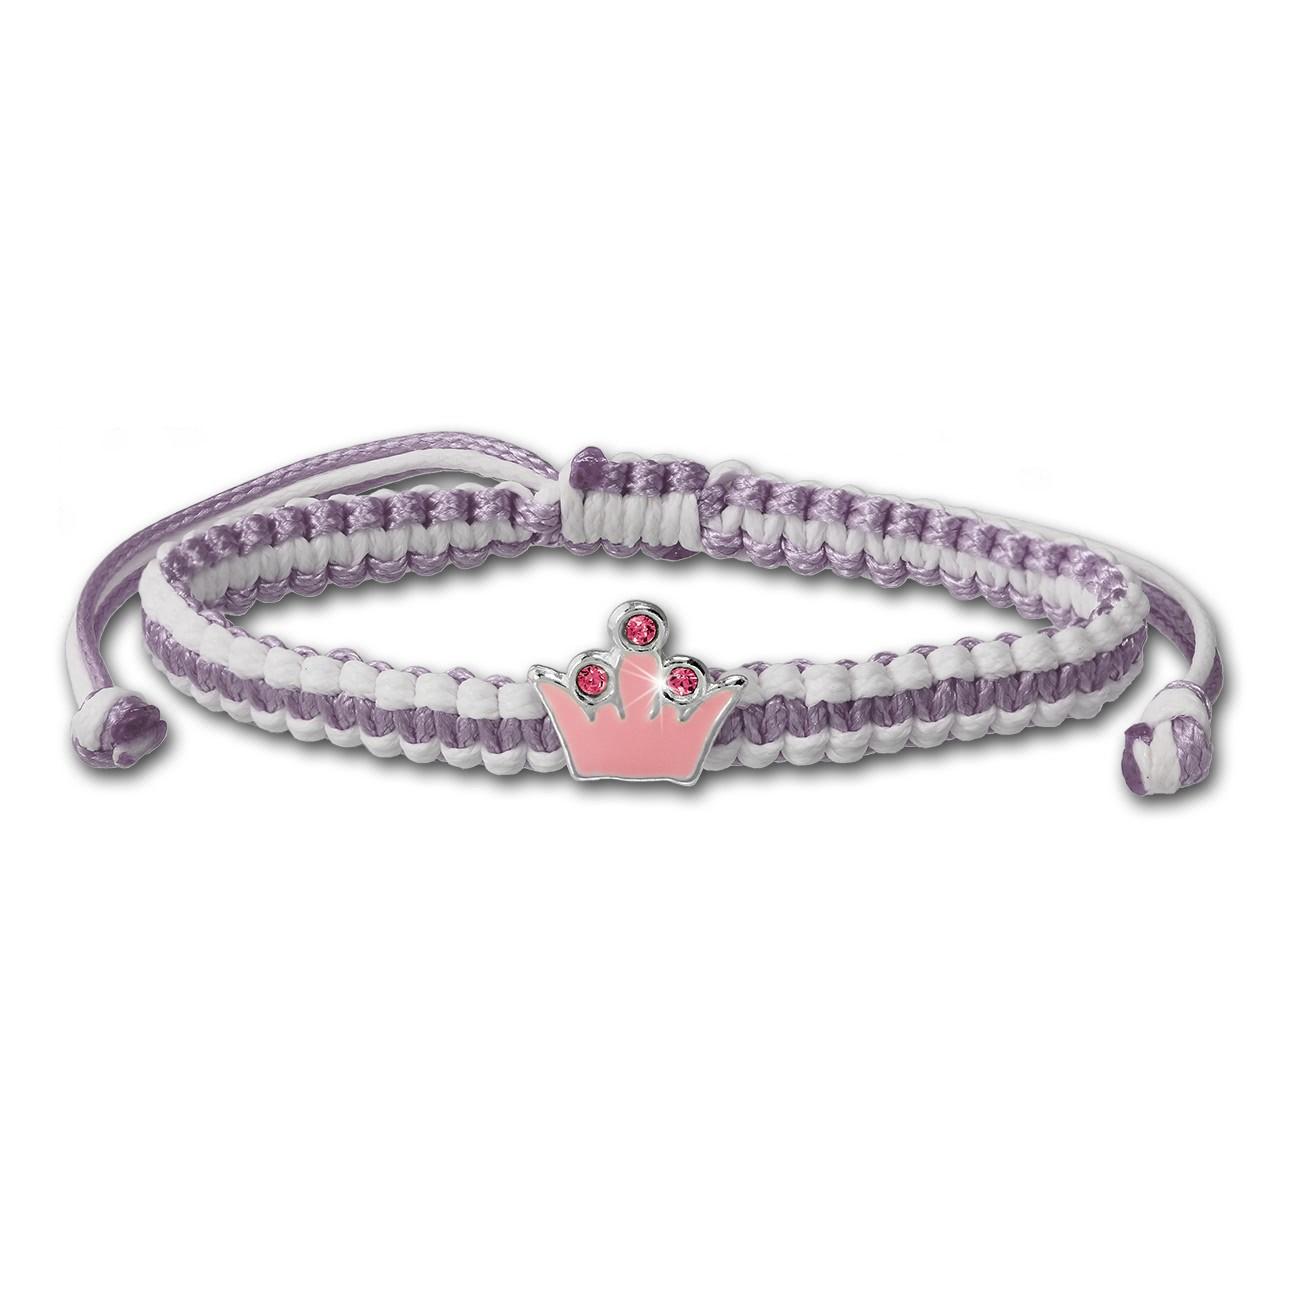 Kinder Armband pink Krone Kinderschmuck aus 925er Silber TW SDA8000P